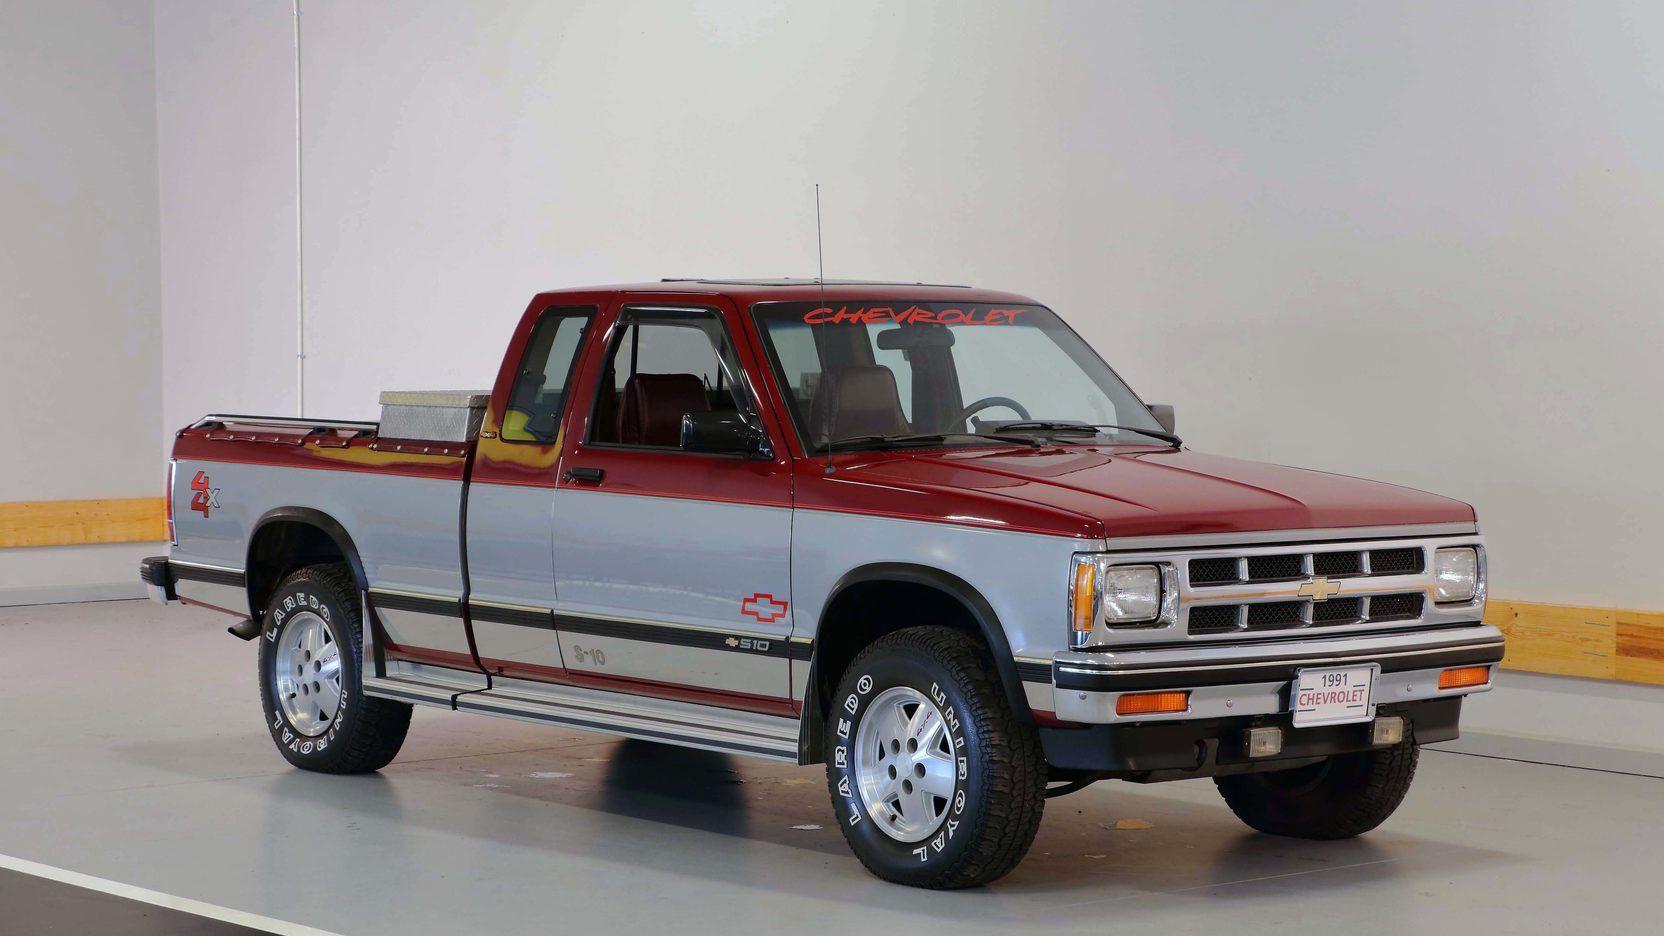 1991 Chevrolet S10 Pickup S10 Pickup Chevy S10 S10 Truck